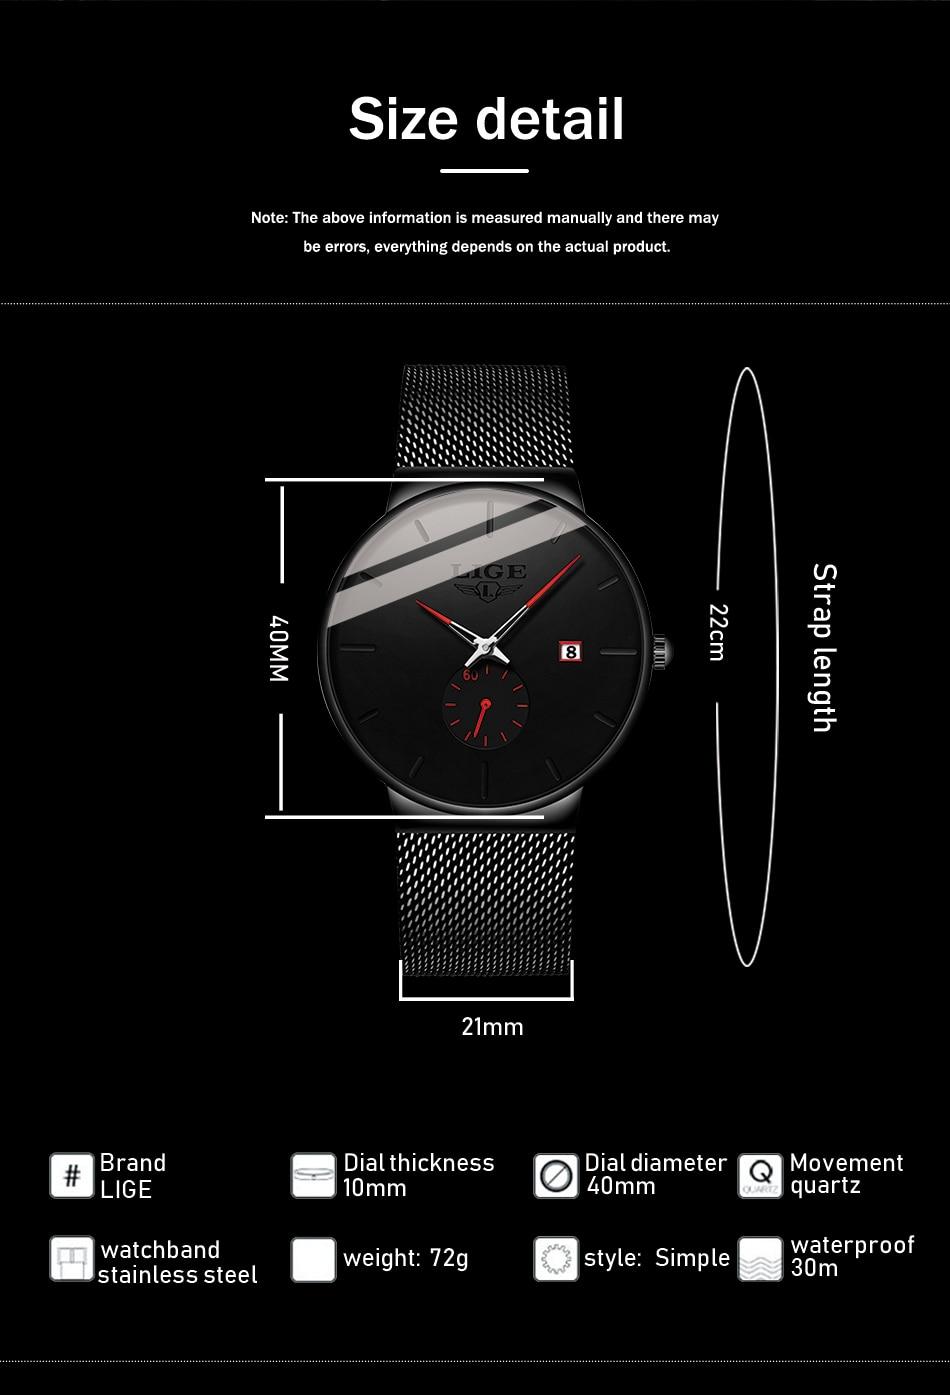 H87a8ff7a6c62426b9a7050de30e20e3fh New LIGE Mens Watches Casual Fashion Gift Men Watch Business Waterproof Quartz Watch Full Steel Clock Relogio Masculino+Box